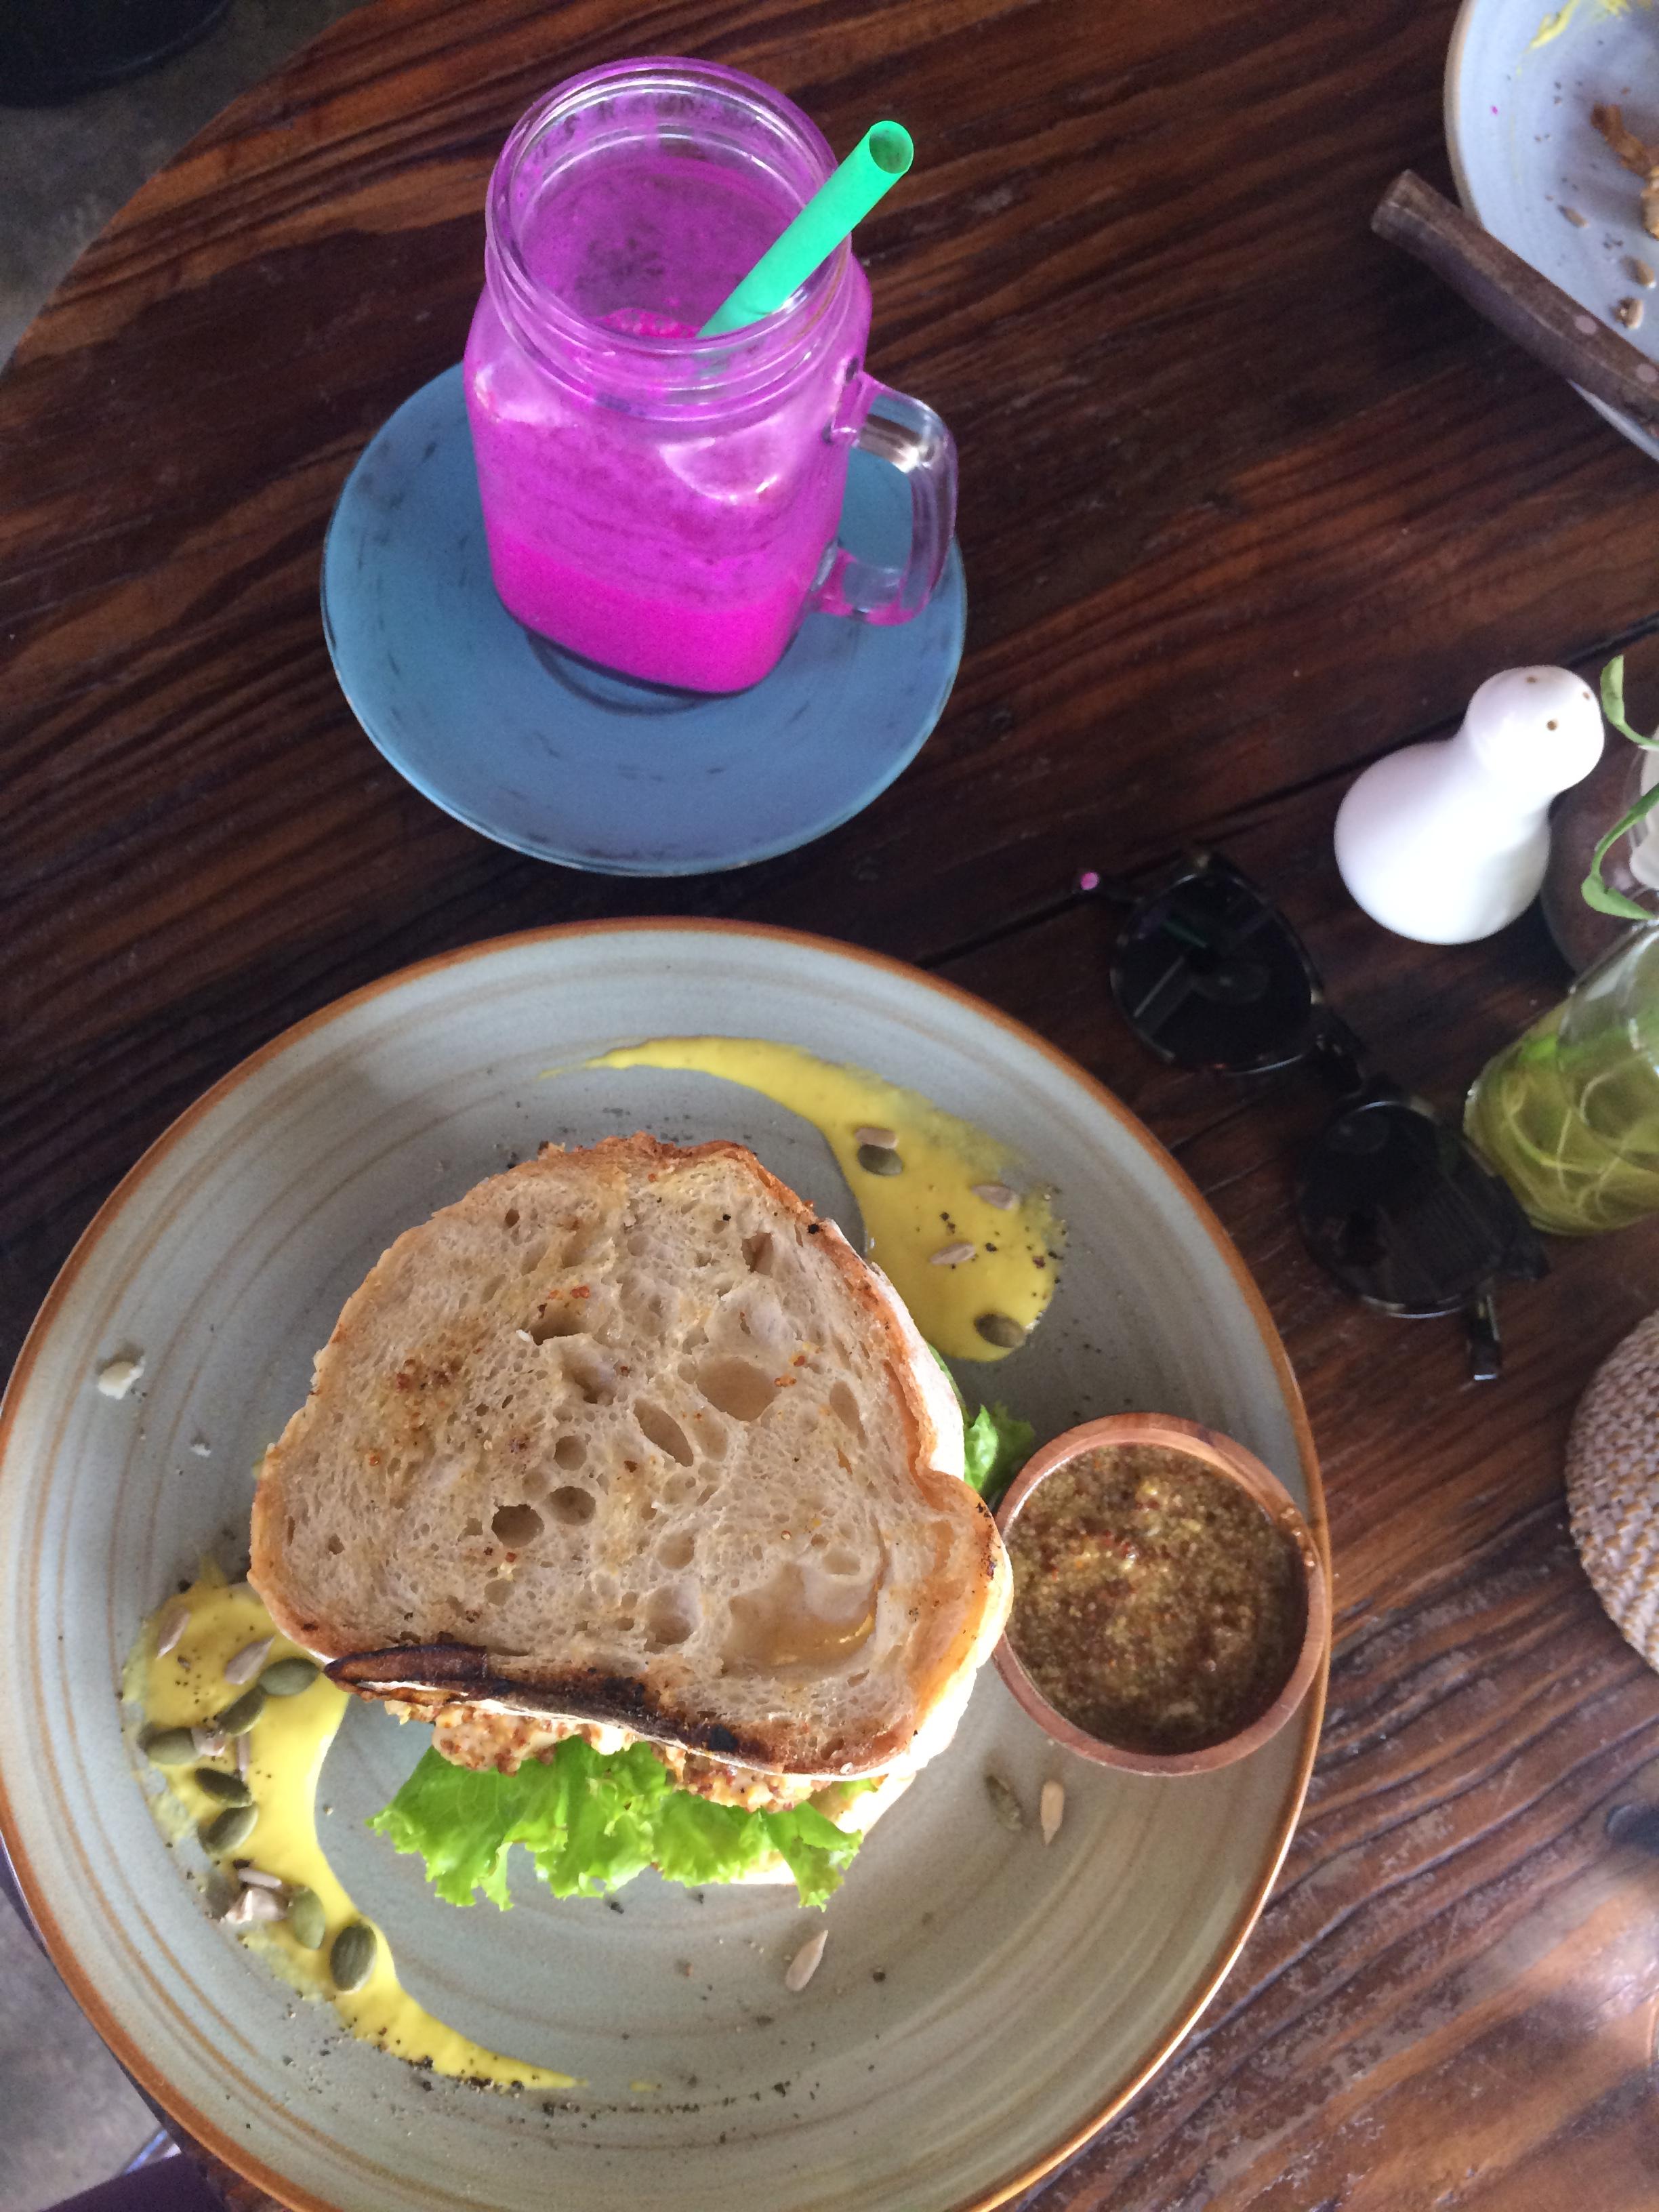 Dragonfruit smoothie and chicken sandwich from Sukka.